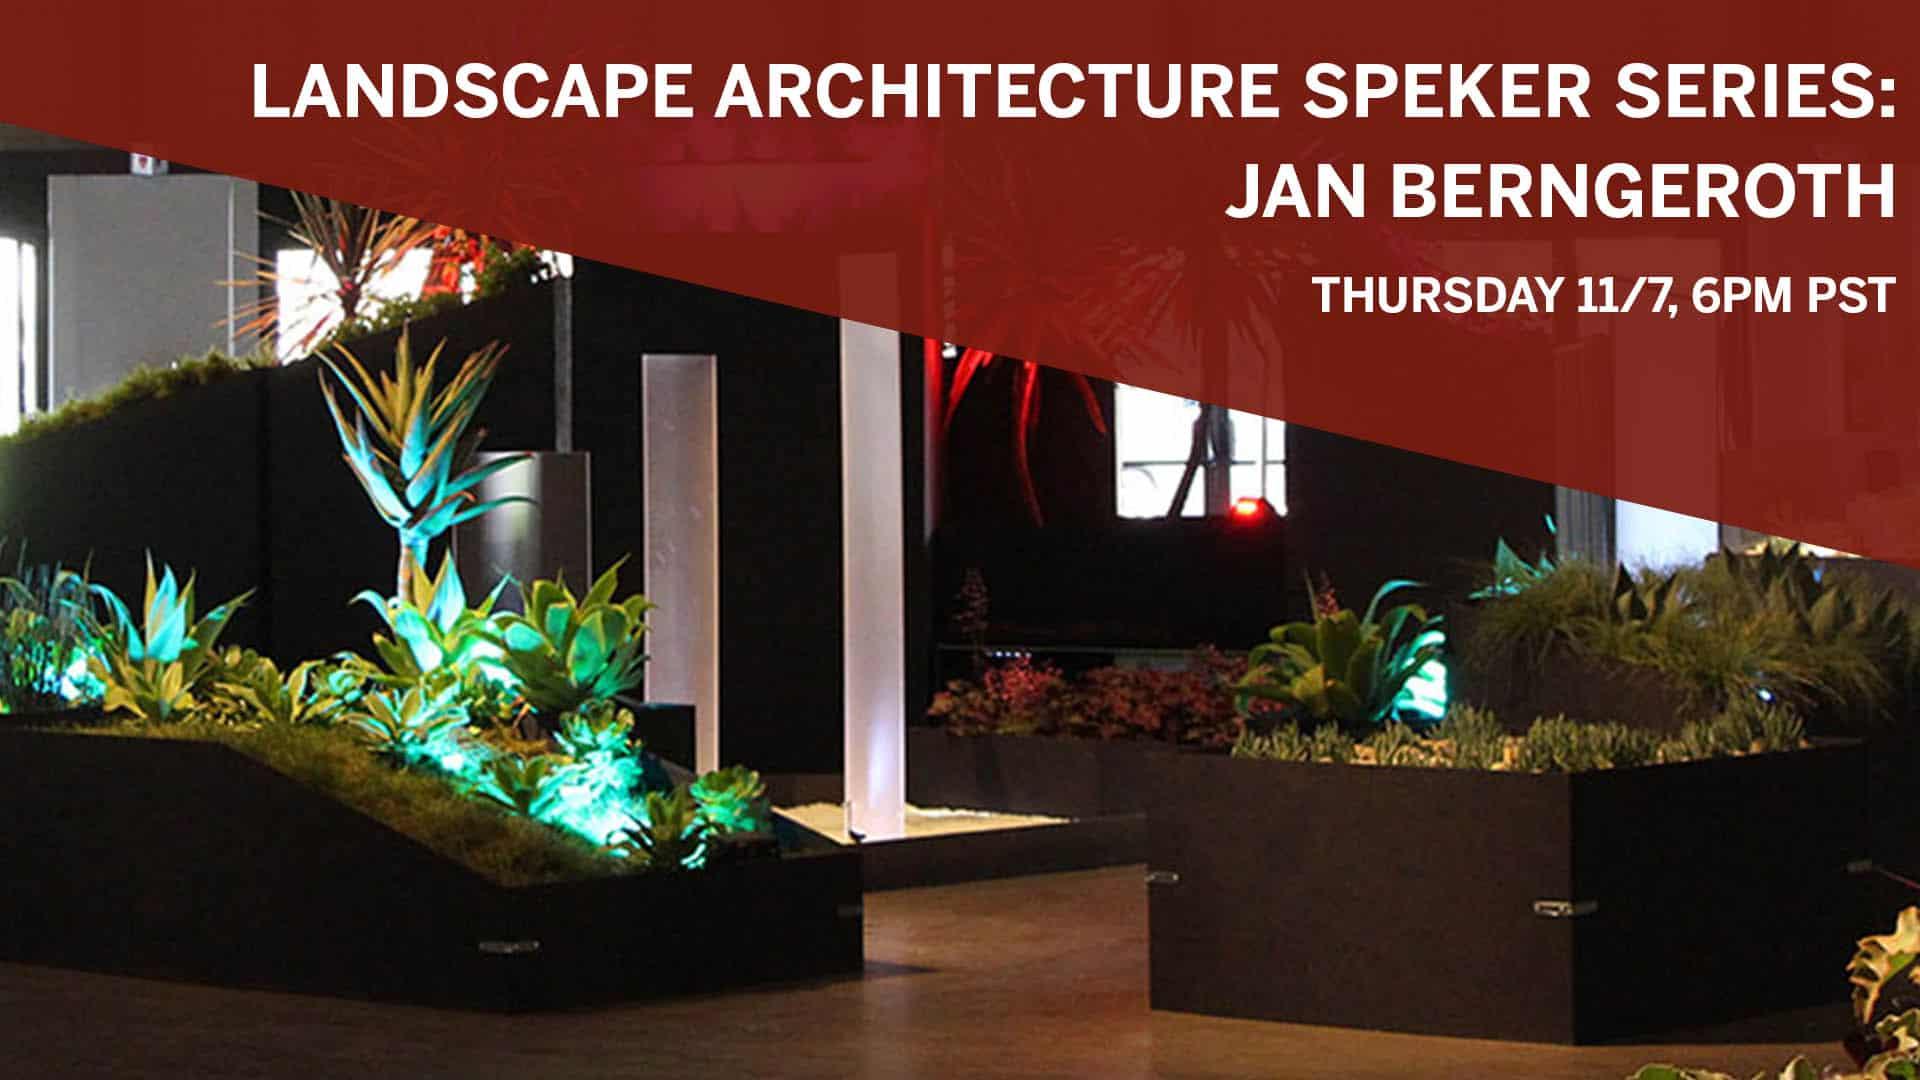 Landscape Architecture Speaker Series: Jan Berngeroth